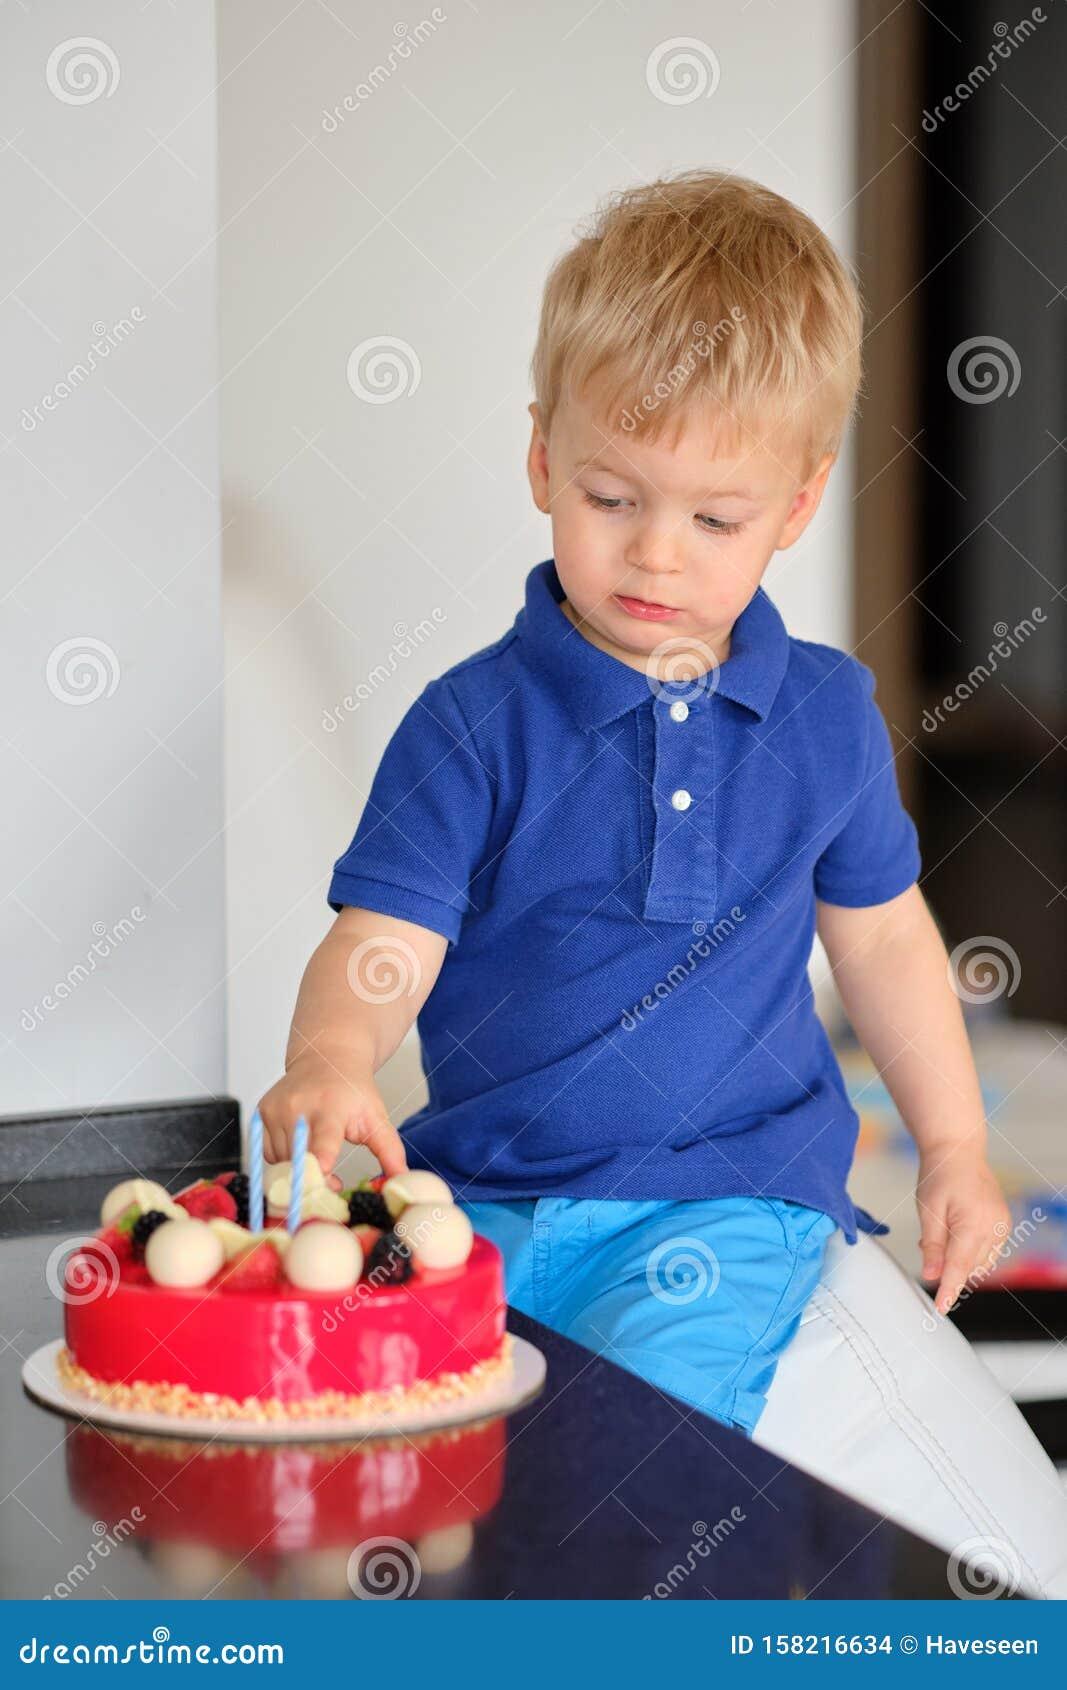 Fabulous Boy Trying Birthday Cake Stock Photo Image Of Caucasian 158216634 Funny Birthday Cards Online Inifodamsfinfo